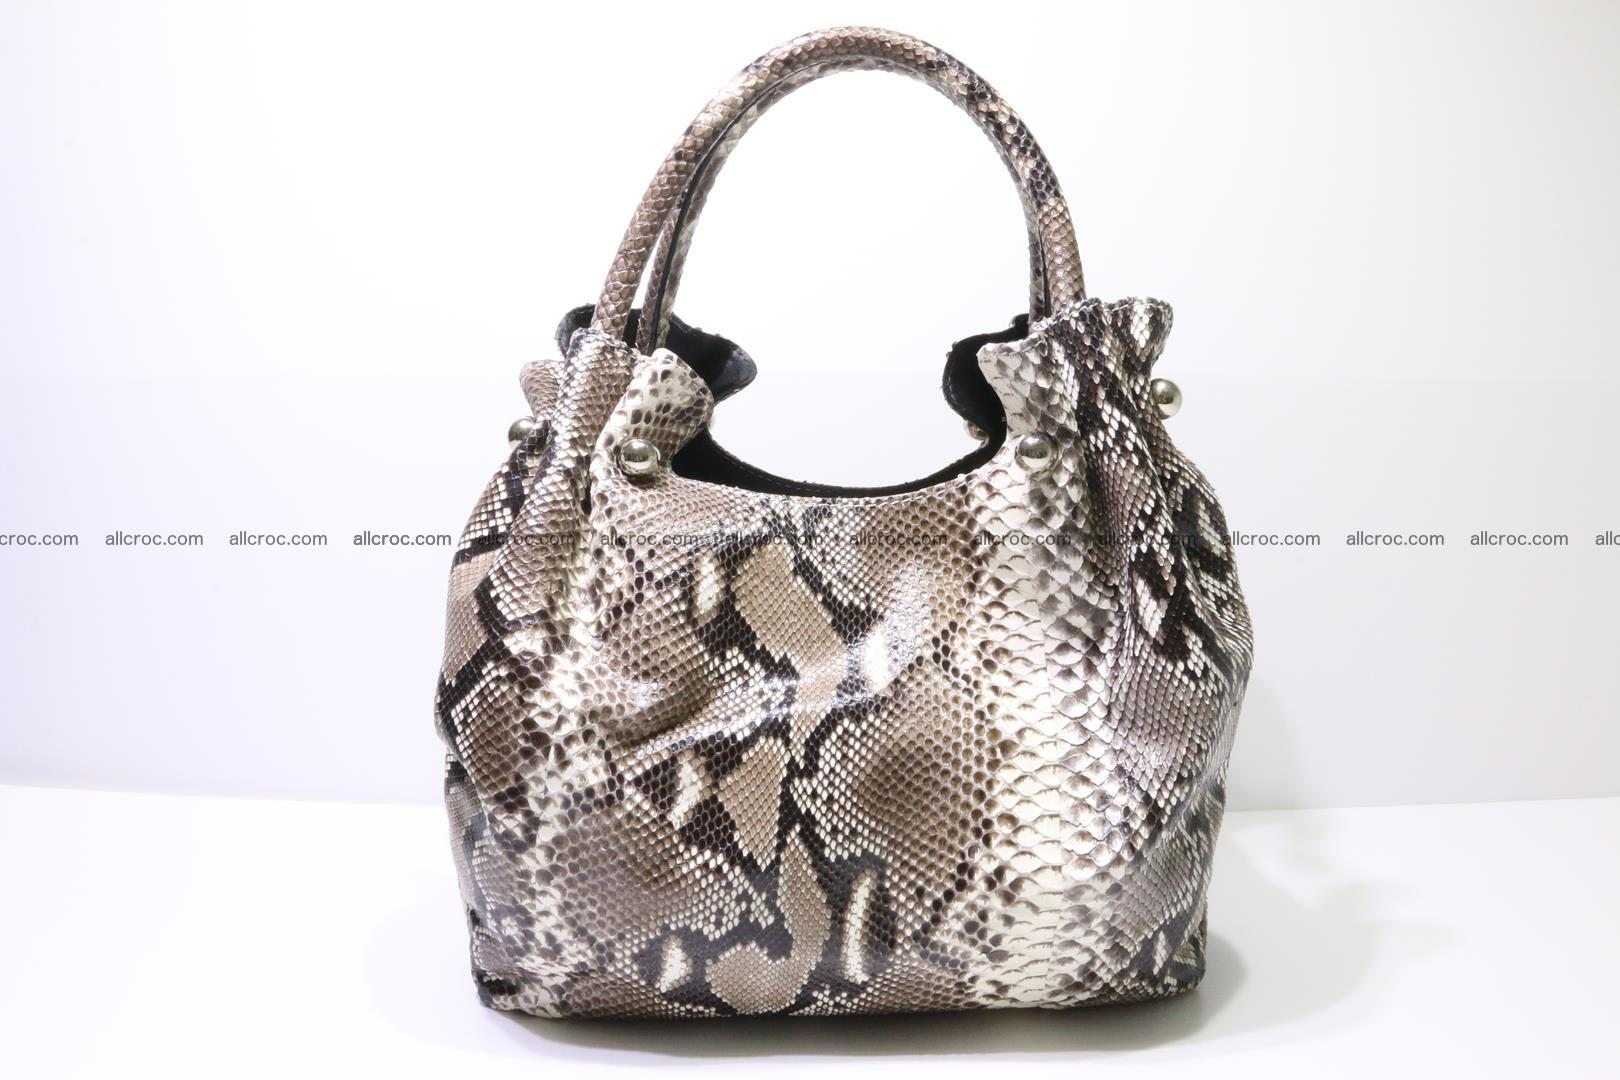 Python skin handbag for lady from genuine Python skin 202 Foto 0